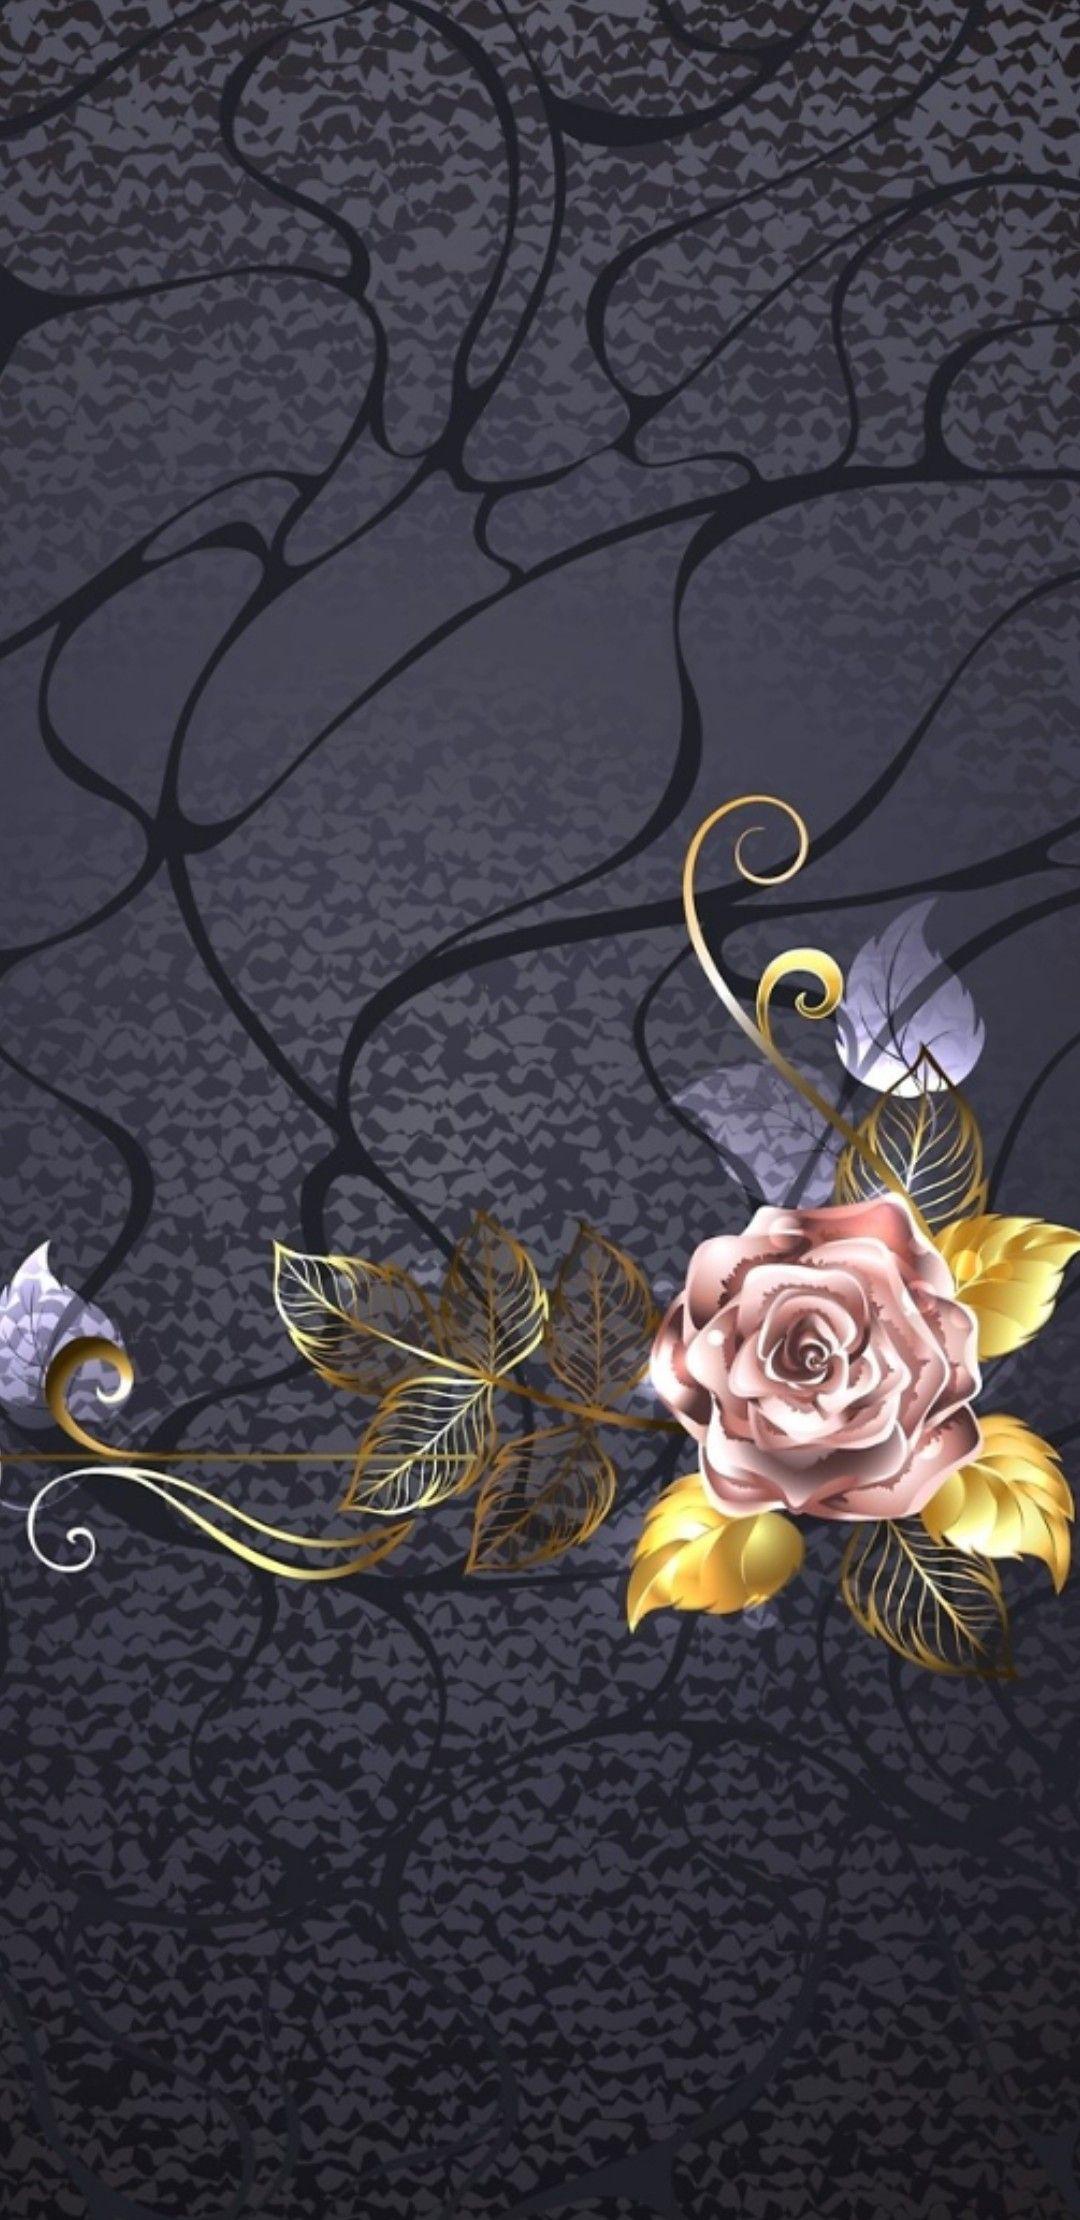 3d Cute Silky Pink Rose Cute Wallpaper Backgrounds Cellphone Wallpaper Rose Wallpaper